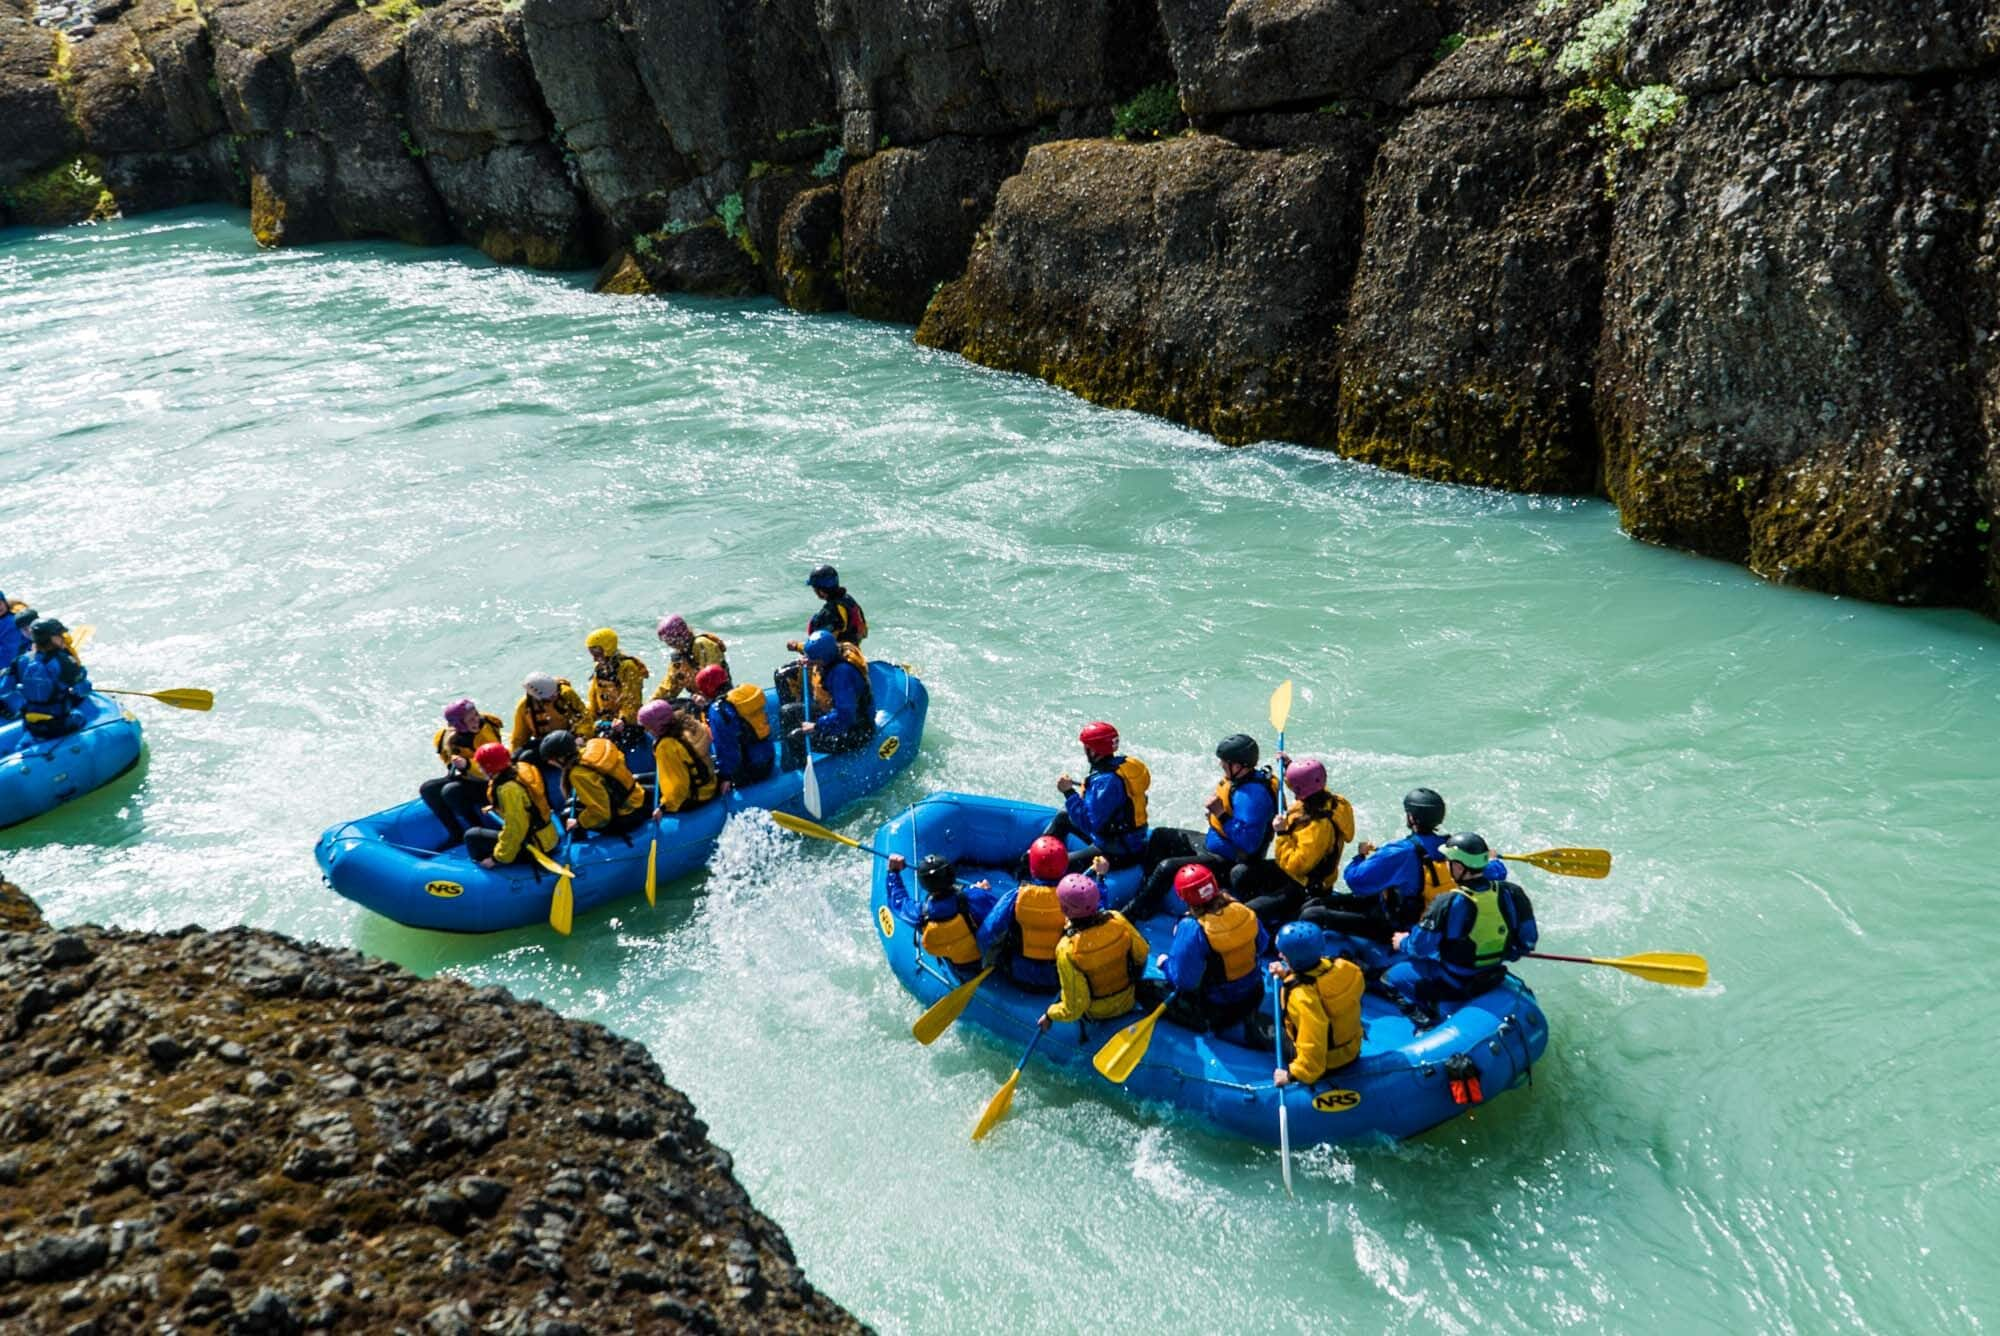 Teen Summer Hiking Trip Iceland Explorer 15